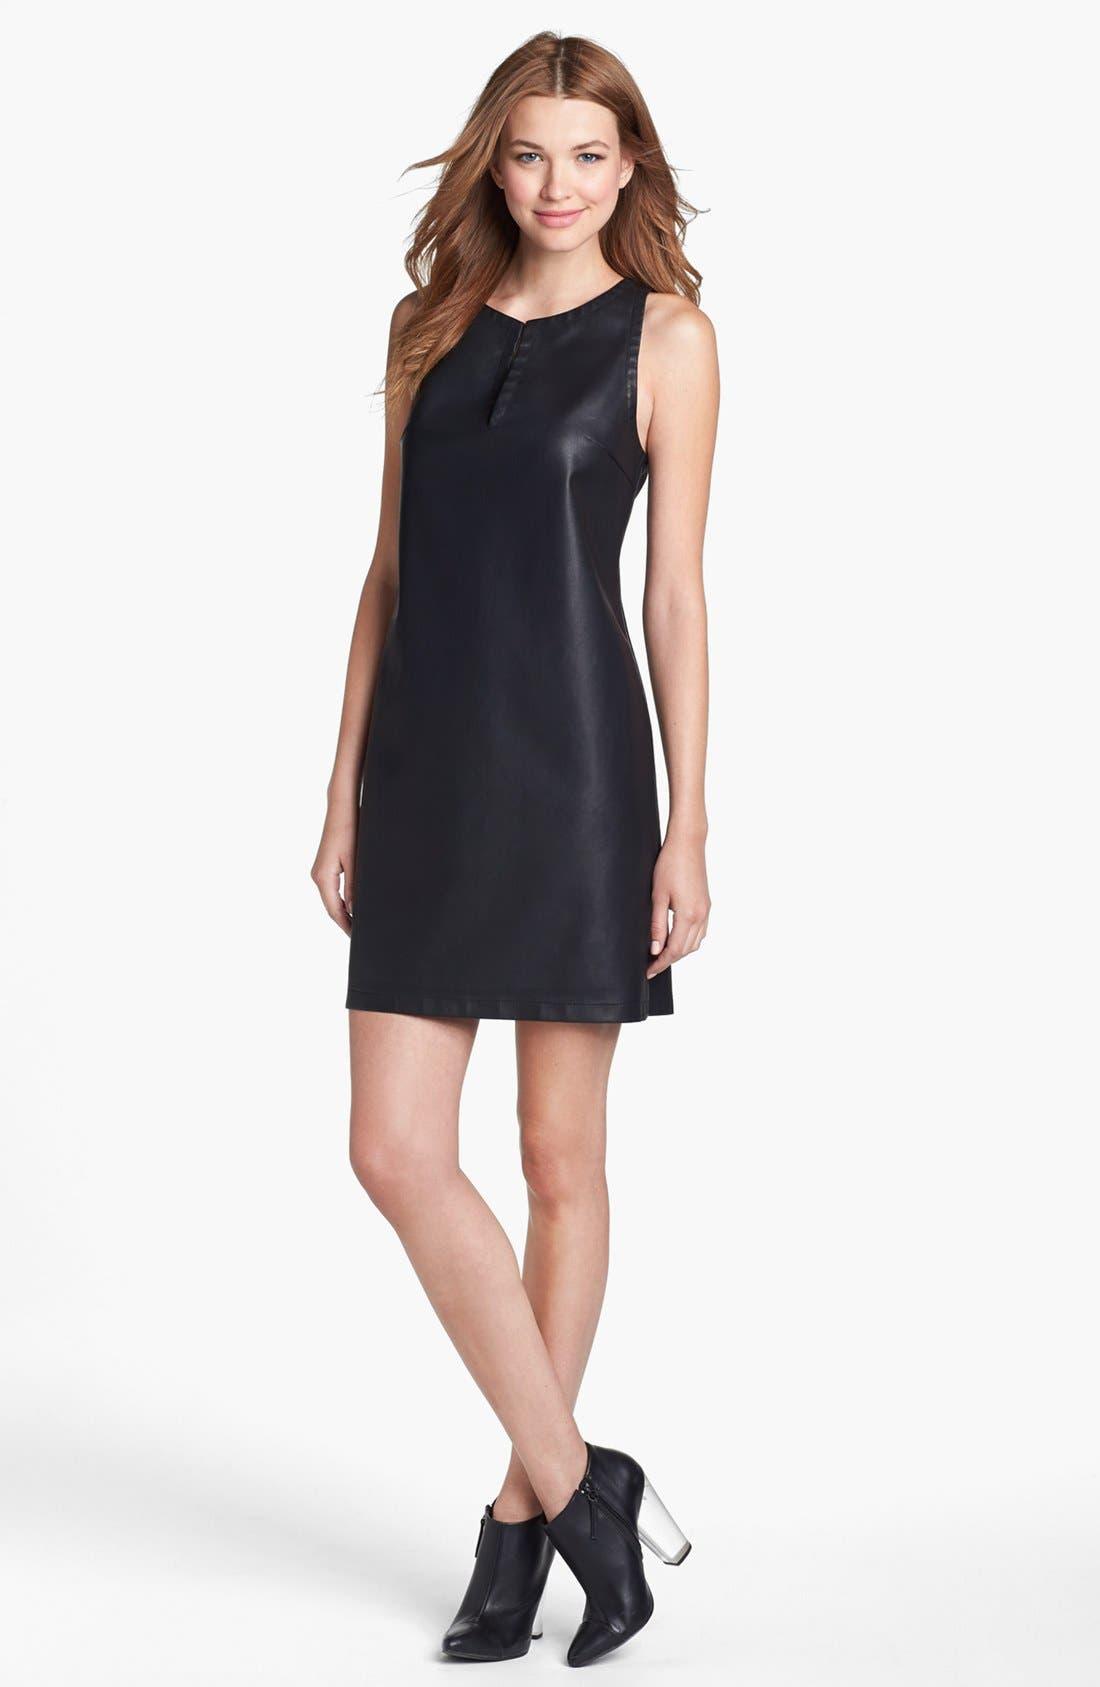 Alternate Image 1 Selected - BB Dakota Faux Leather Shift Dress